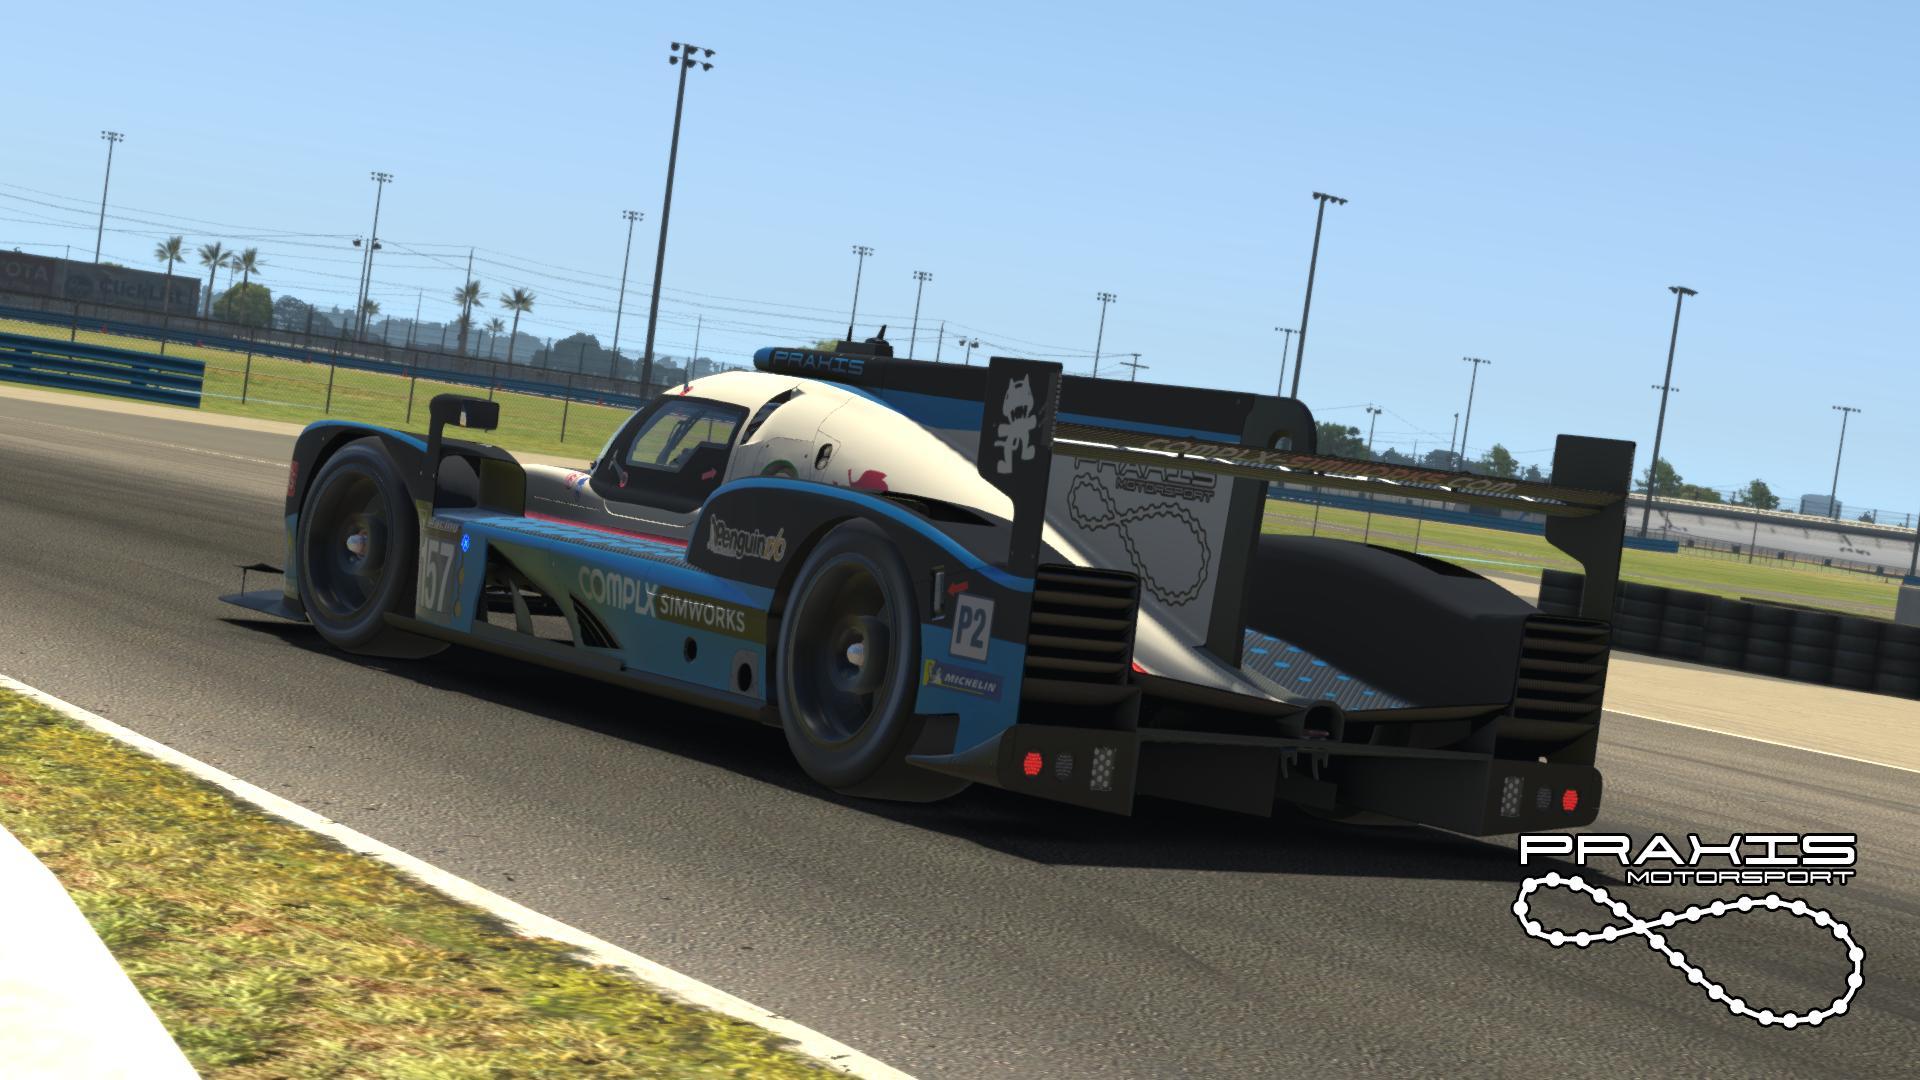 Praxis Motorsport Daytona 24 2021 - Blue Variant by ...